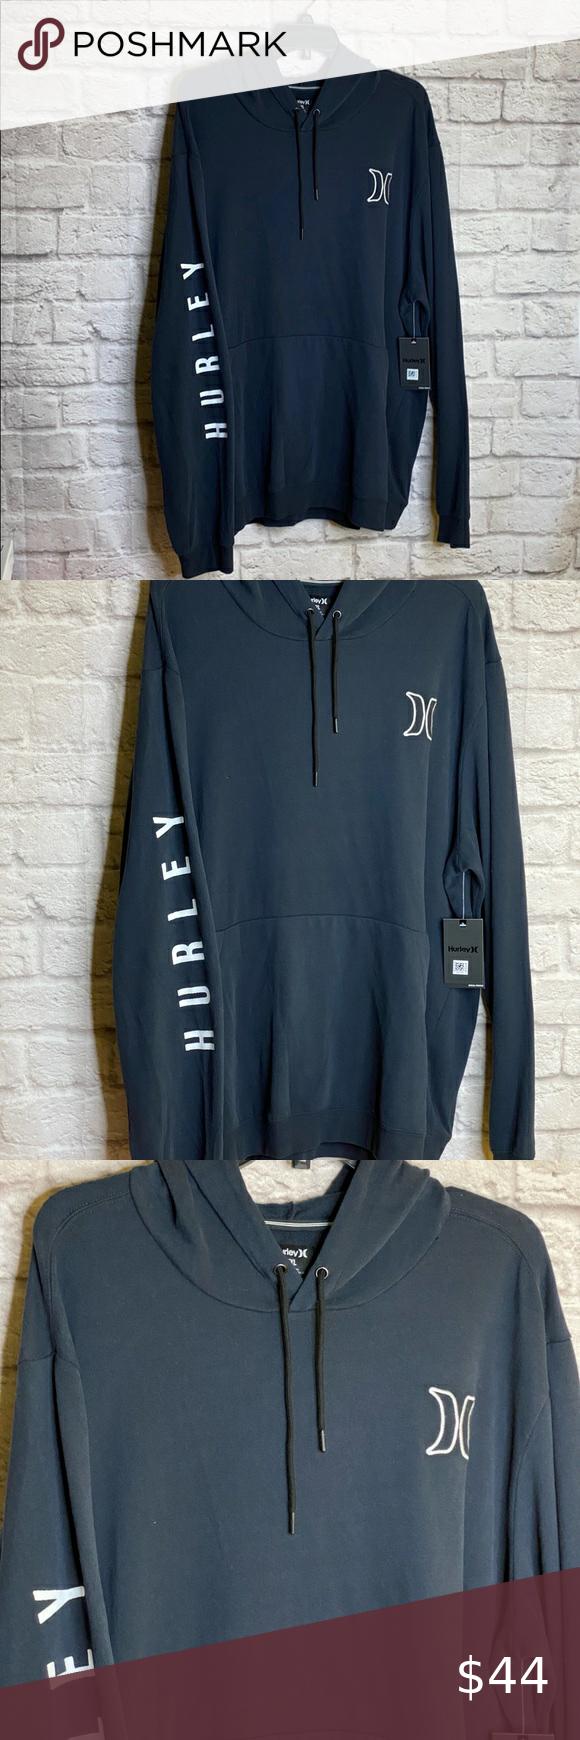 Hurley Black Hoodie Pullover Sz Xxl Mens New Nwt Black Hoodie Black Pullover Hoodie Pullover Hoodie [ 1740 x 580 Pixel ]